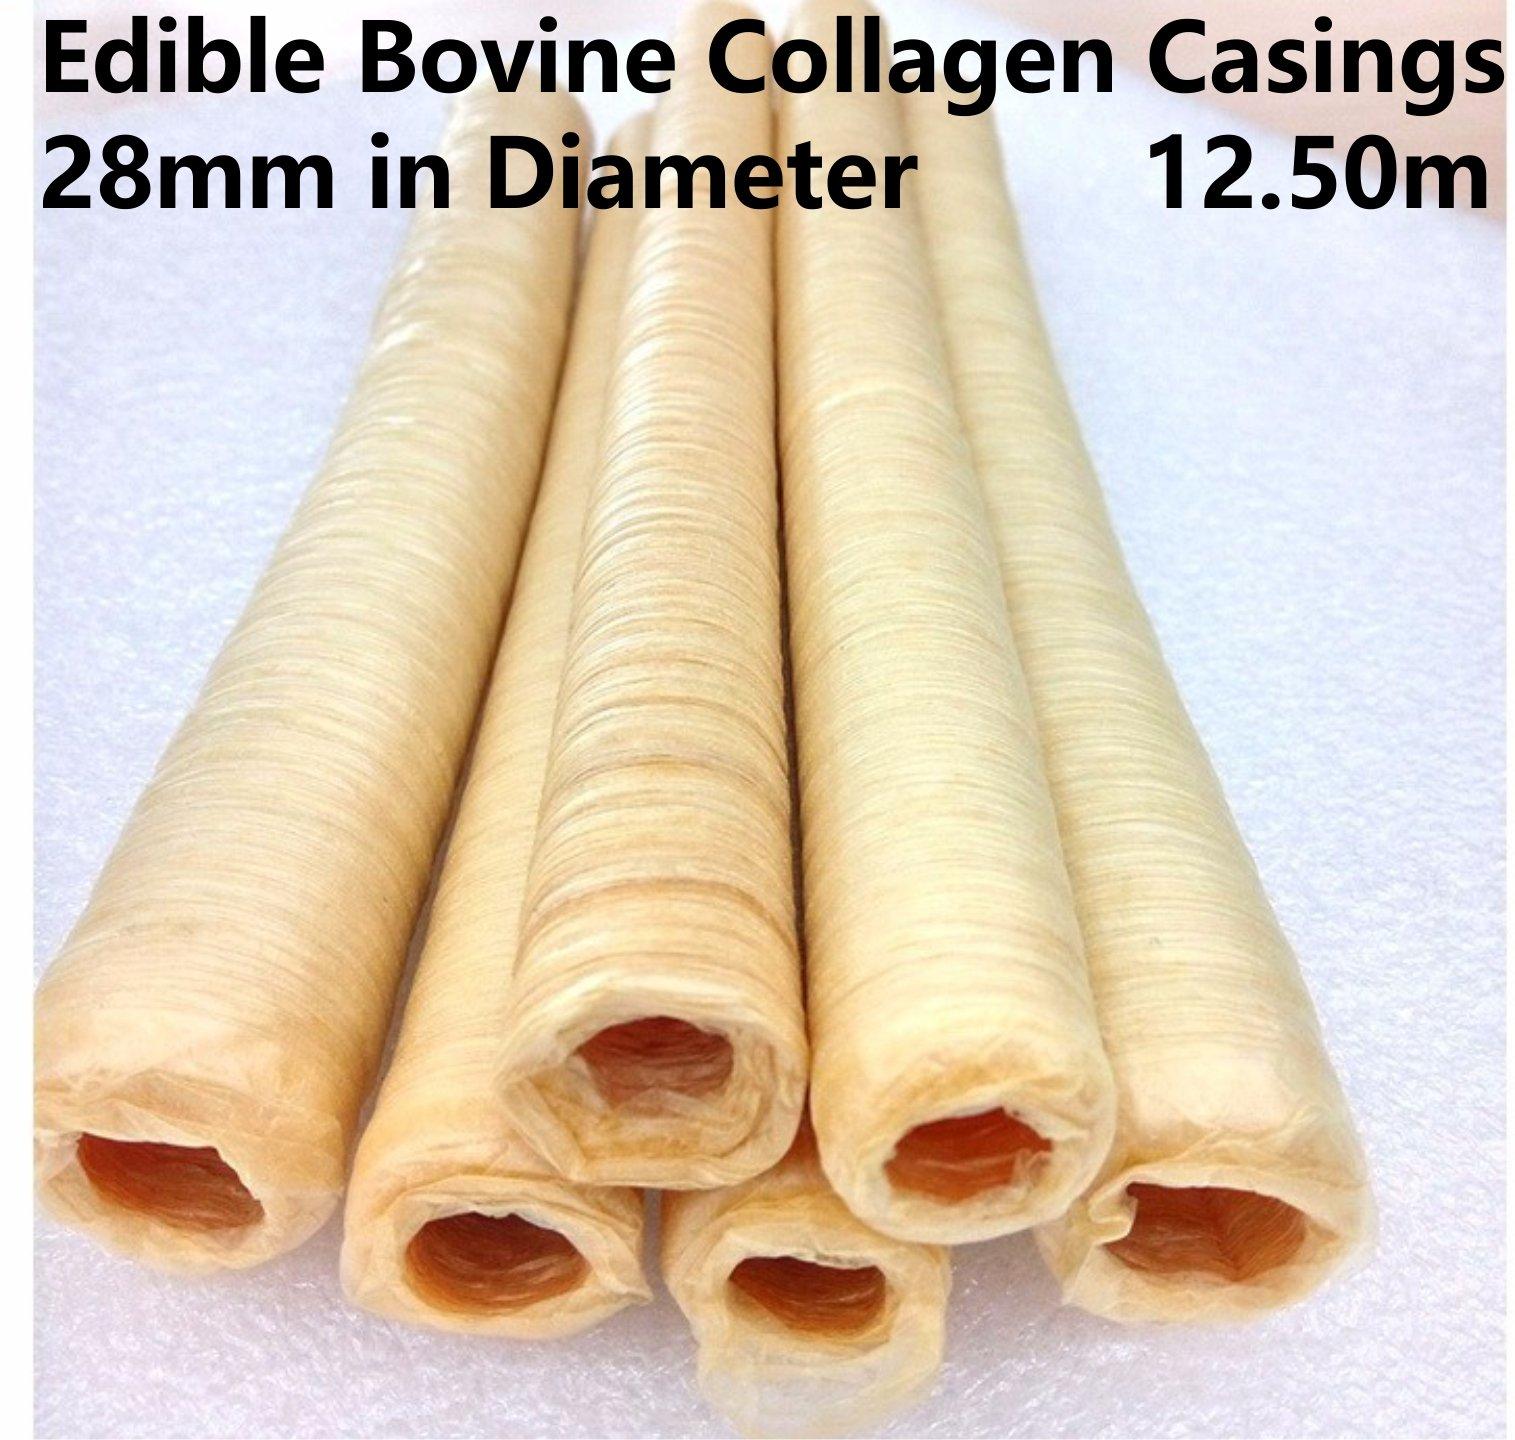 Pack of 2 Edible Bovine Collagen Casings 28mm in Diameter Total Length 25M / 82 Ft